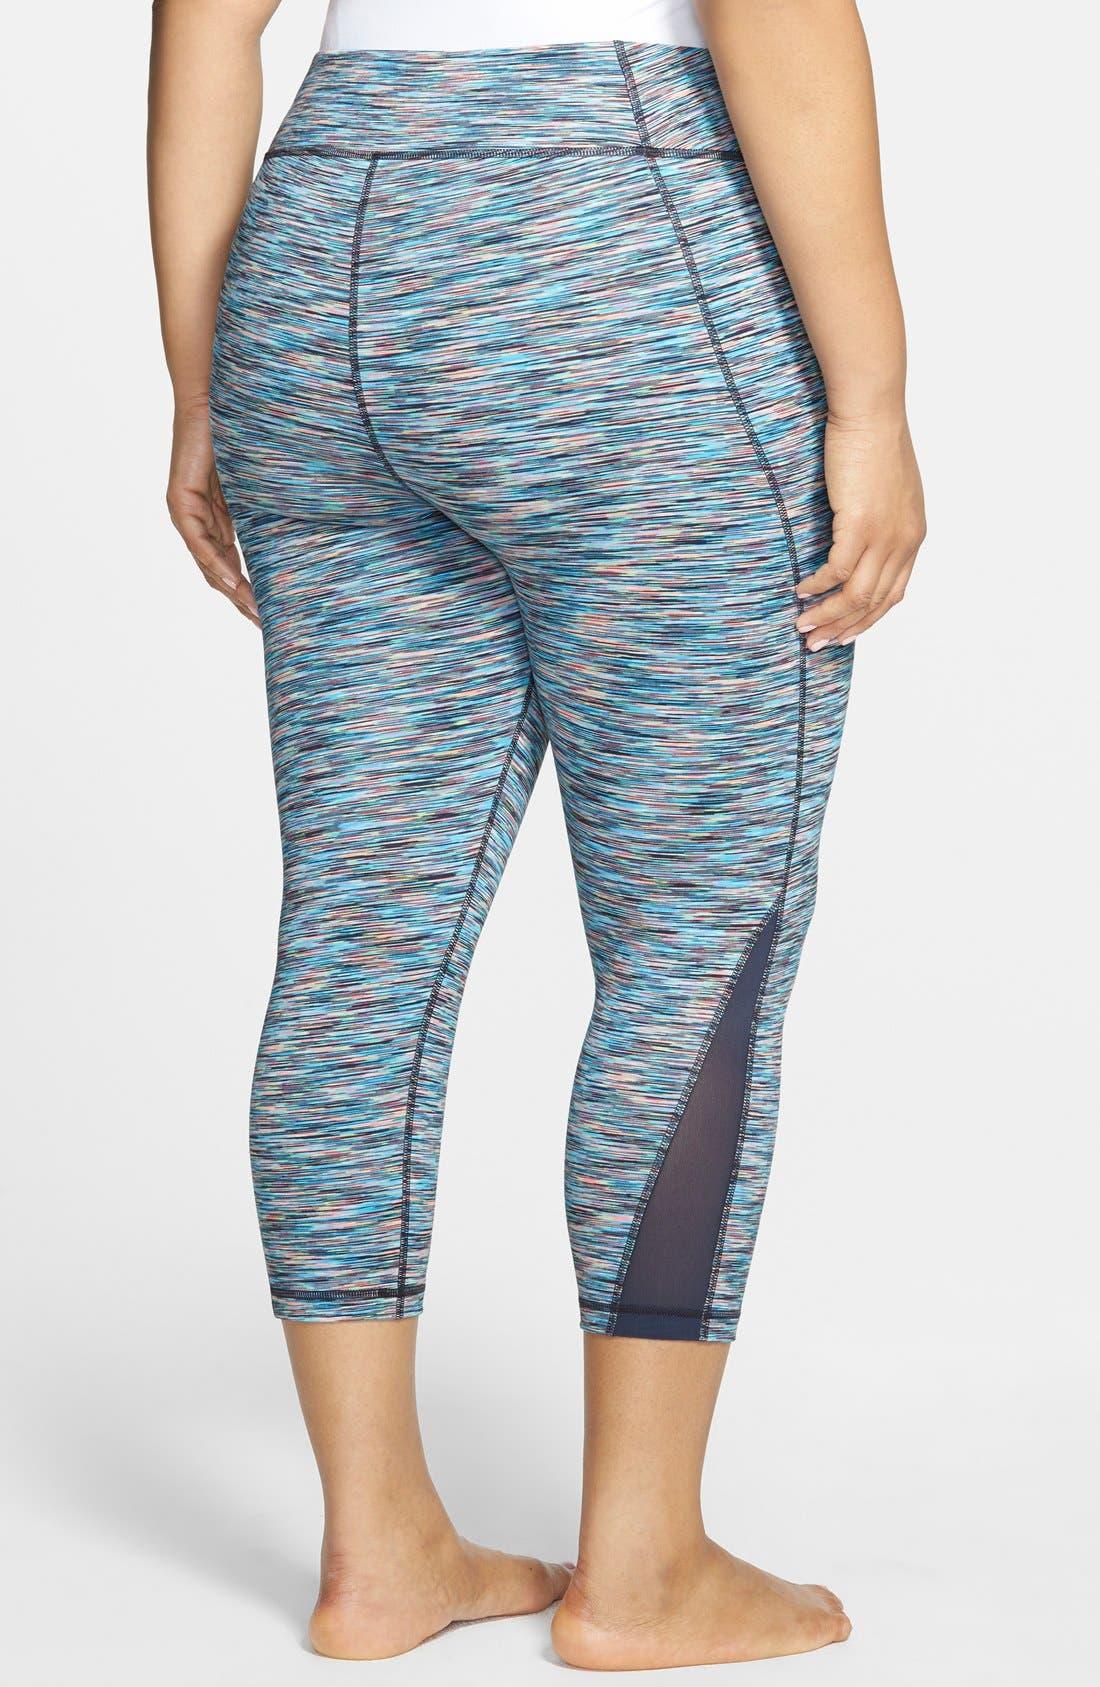 Alternate Image 2  - Zella 'Streamline' Slim Fit Capri Leggings (Plus Size)